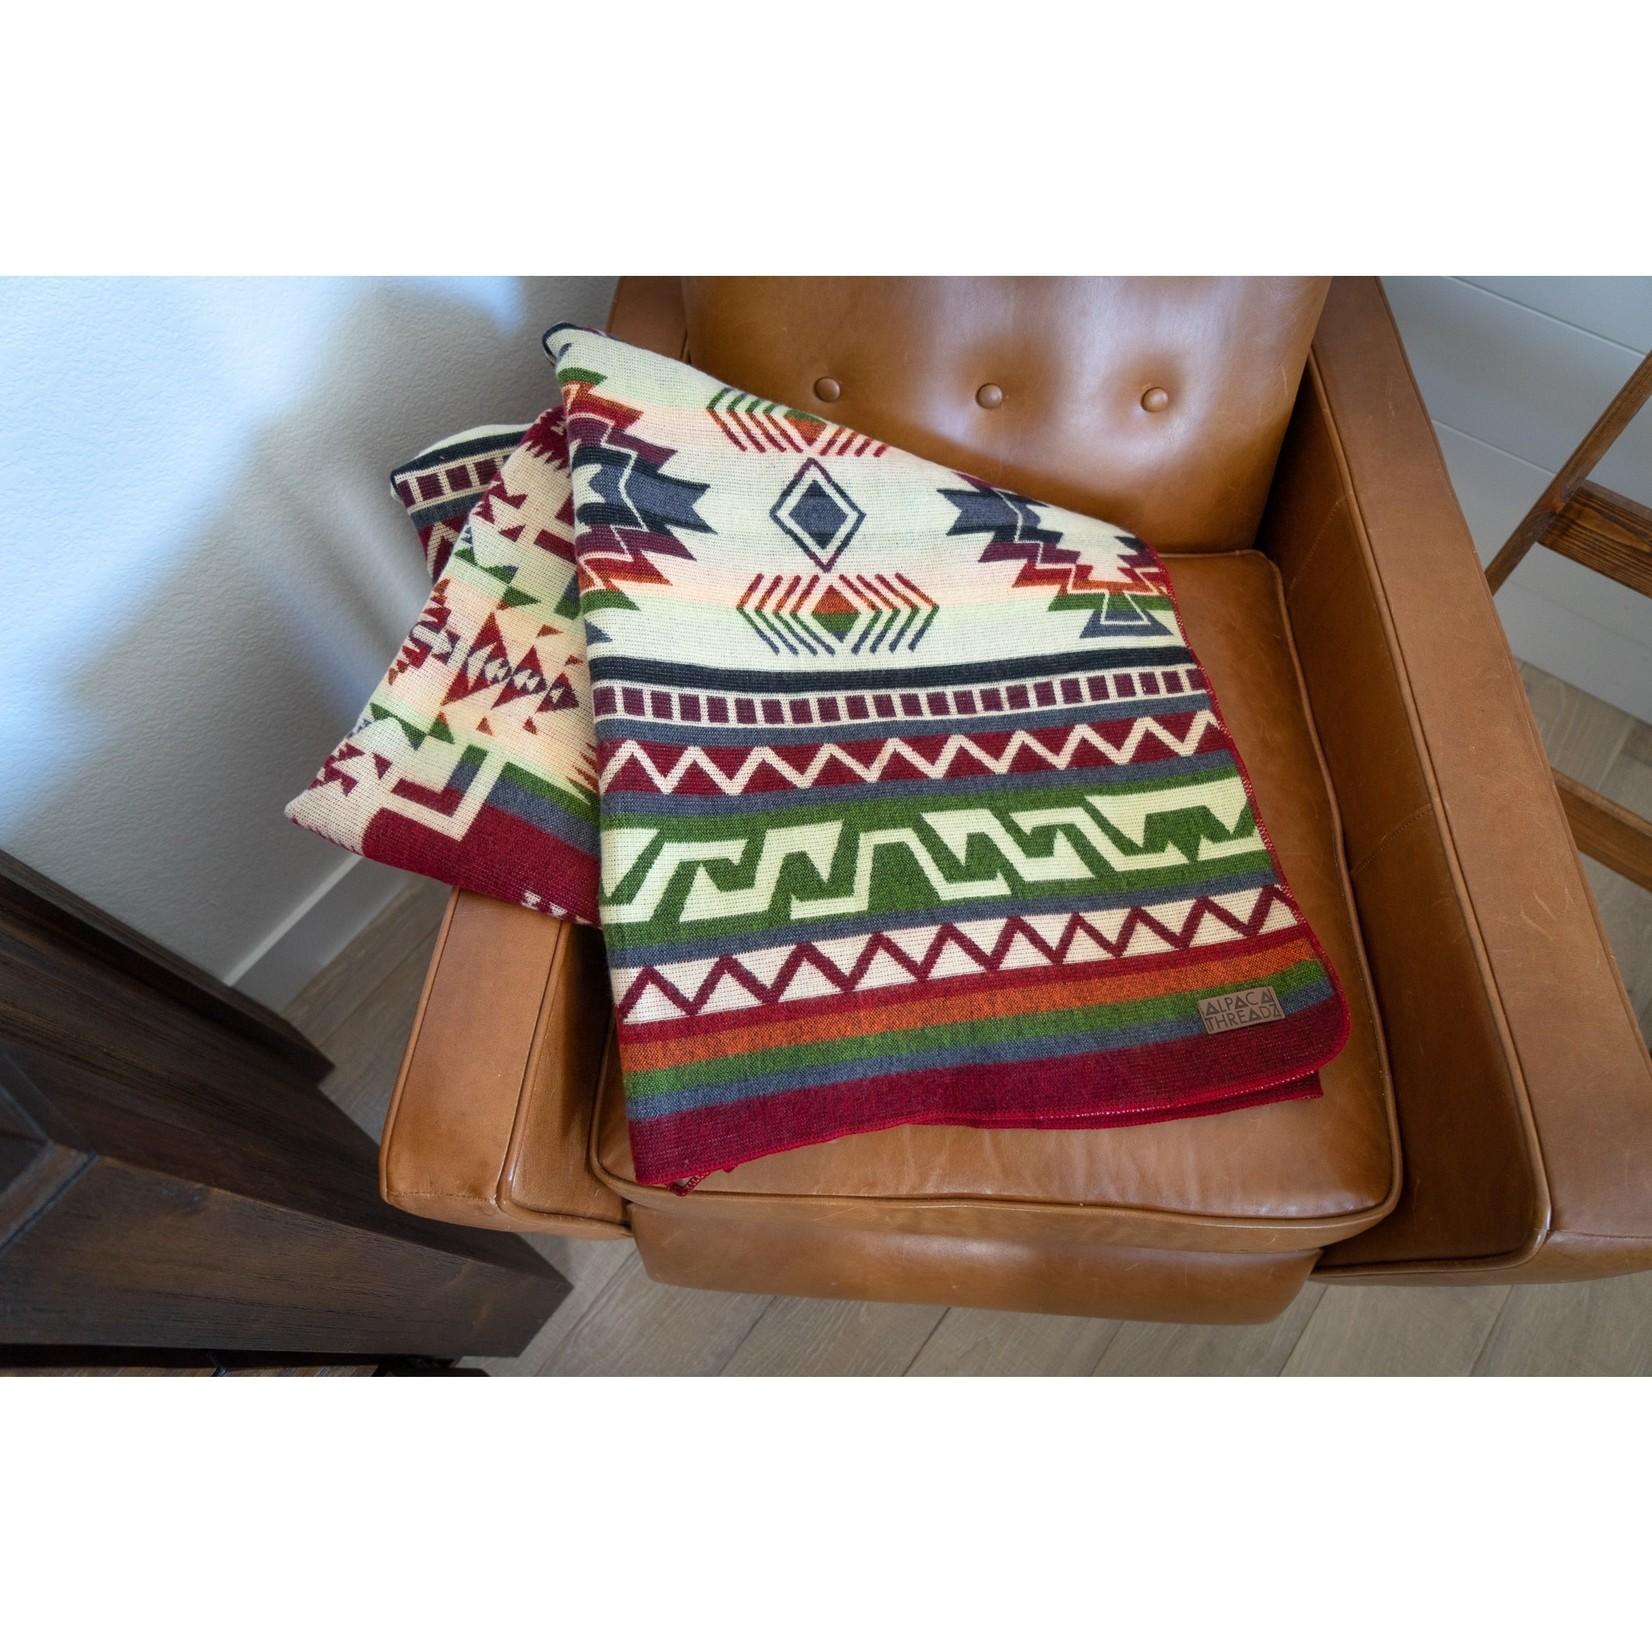 Alpaca Threadz Alpaca Threadz Andean Alpaca Wool Blanket - Retro